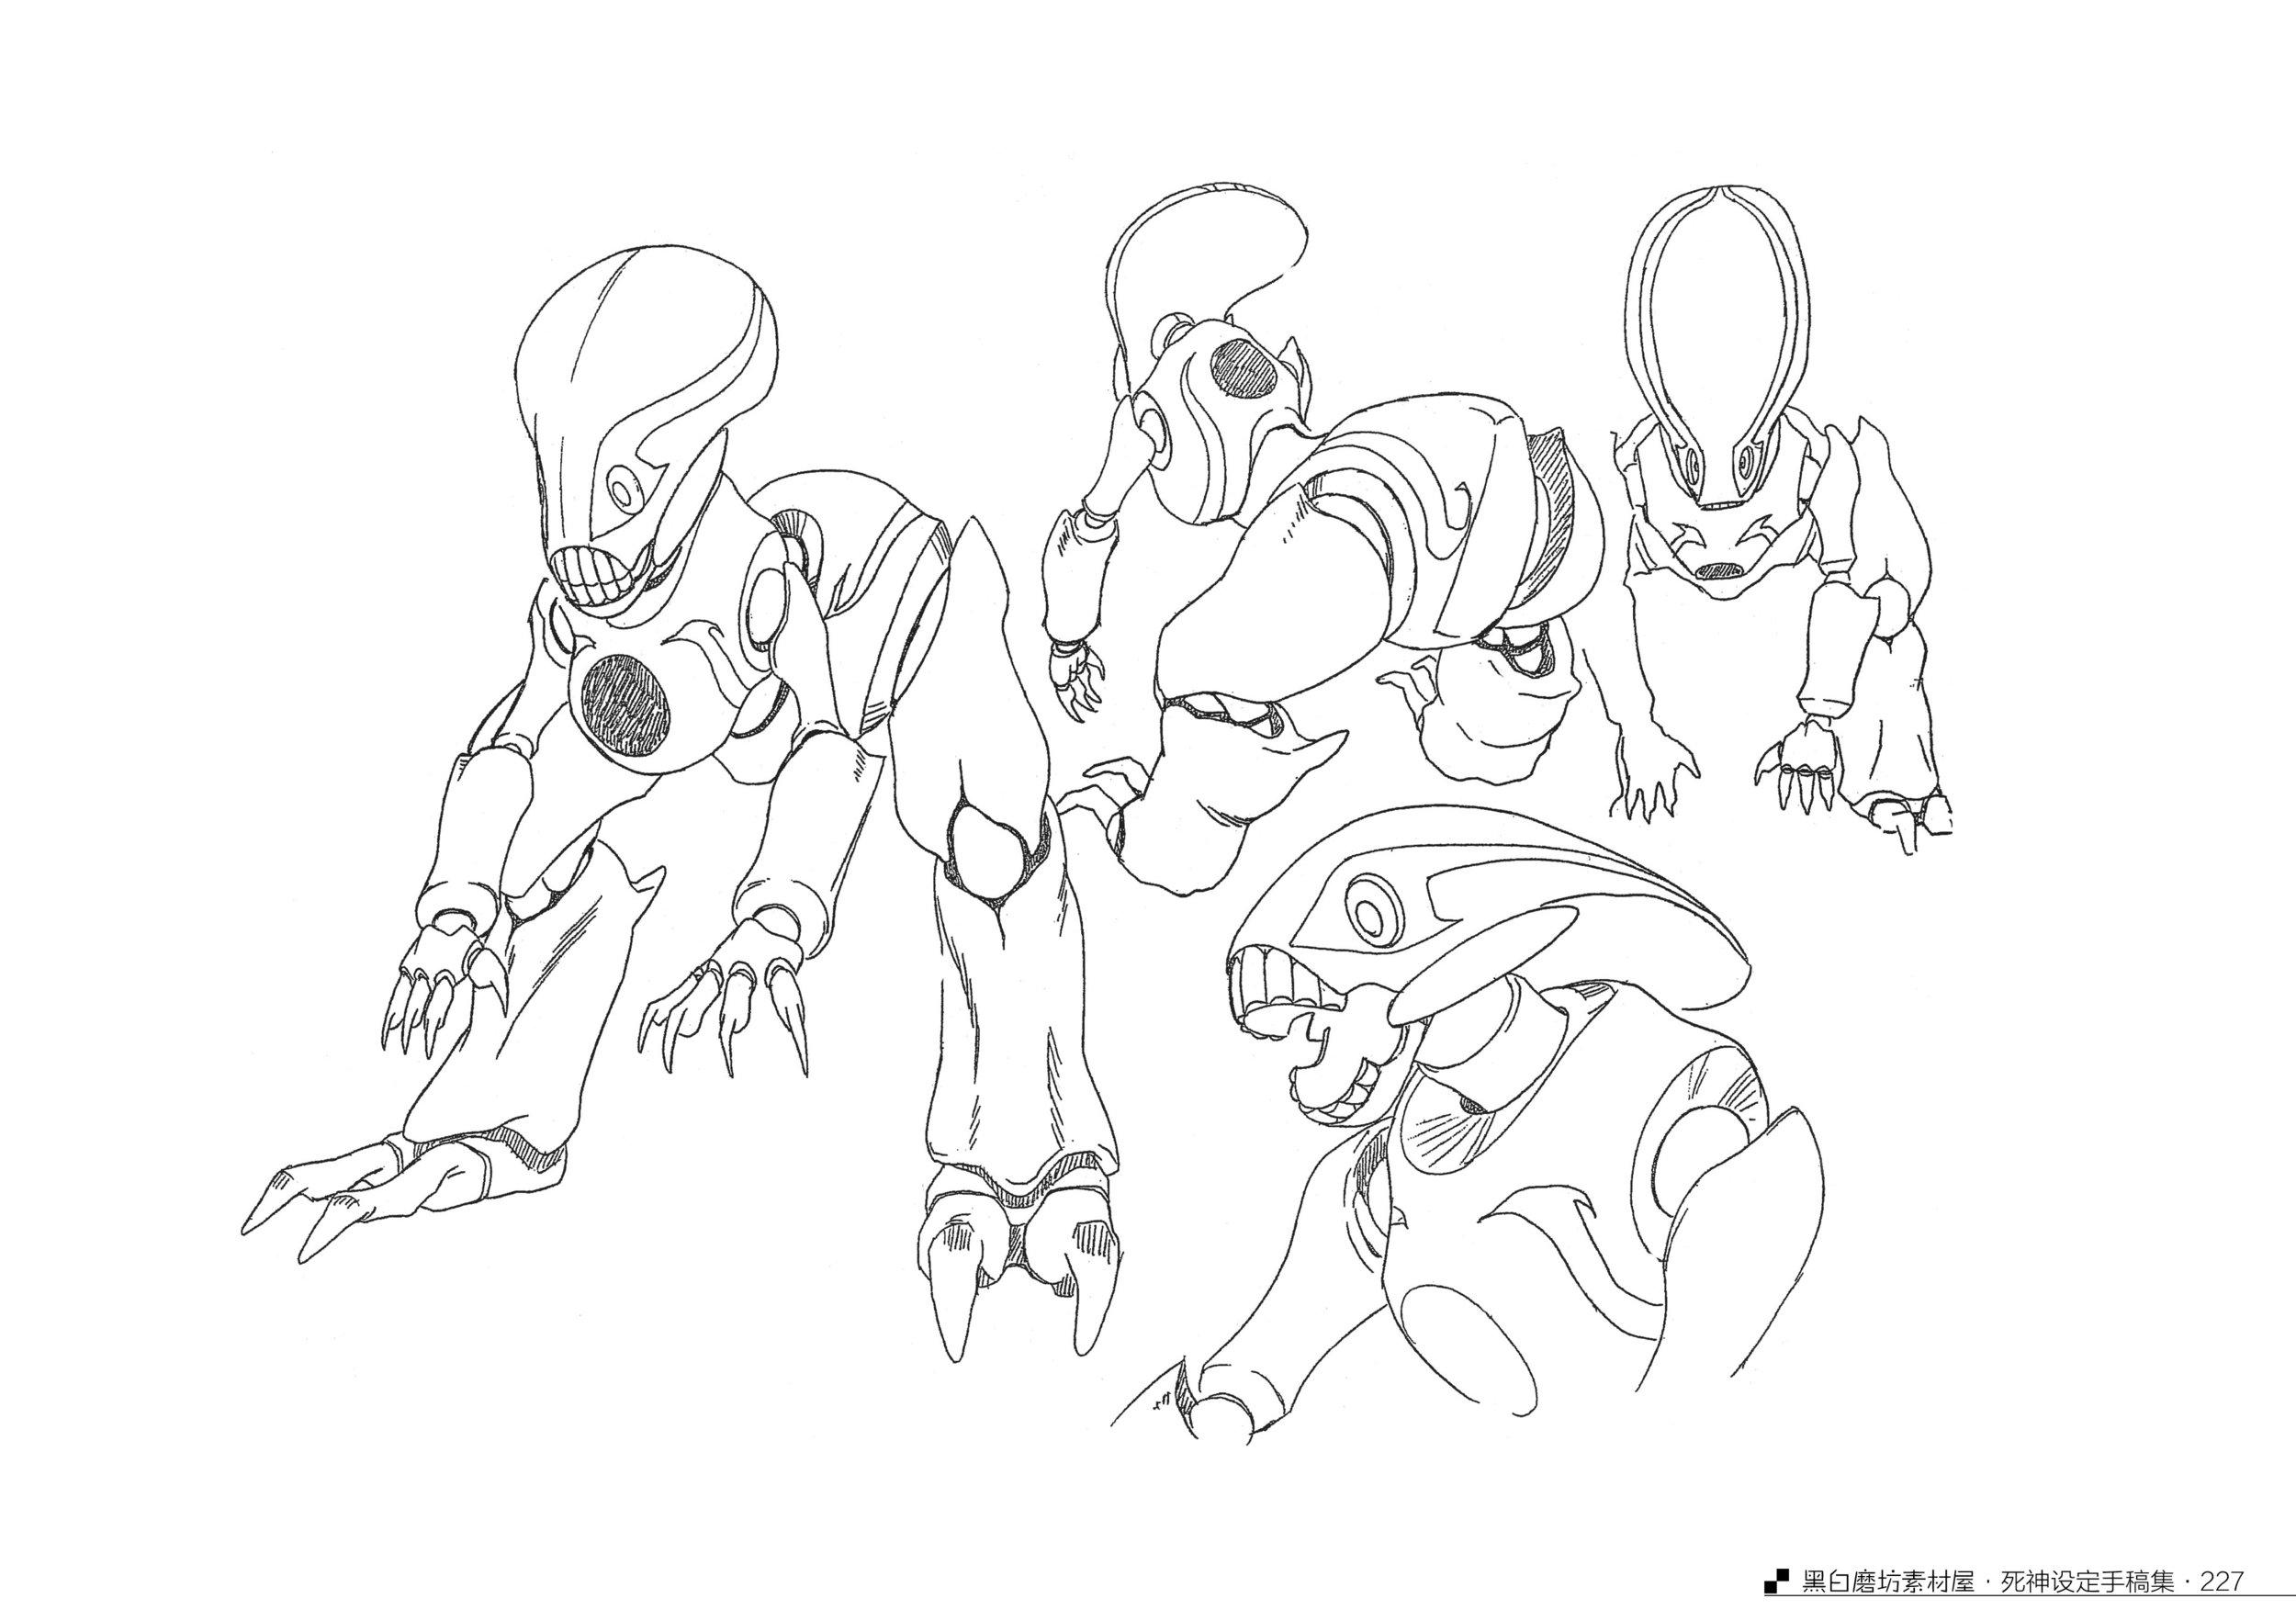 Art of the Bleach A - 205.jpg